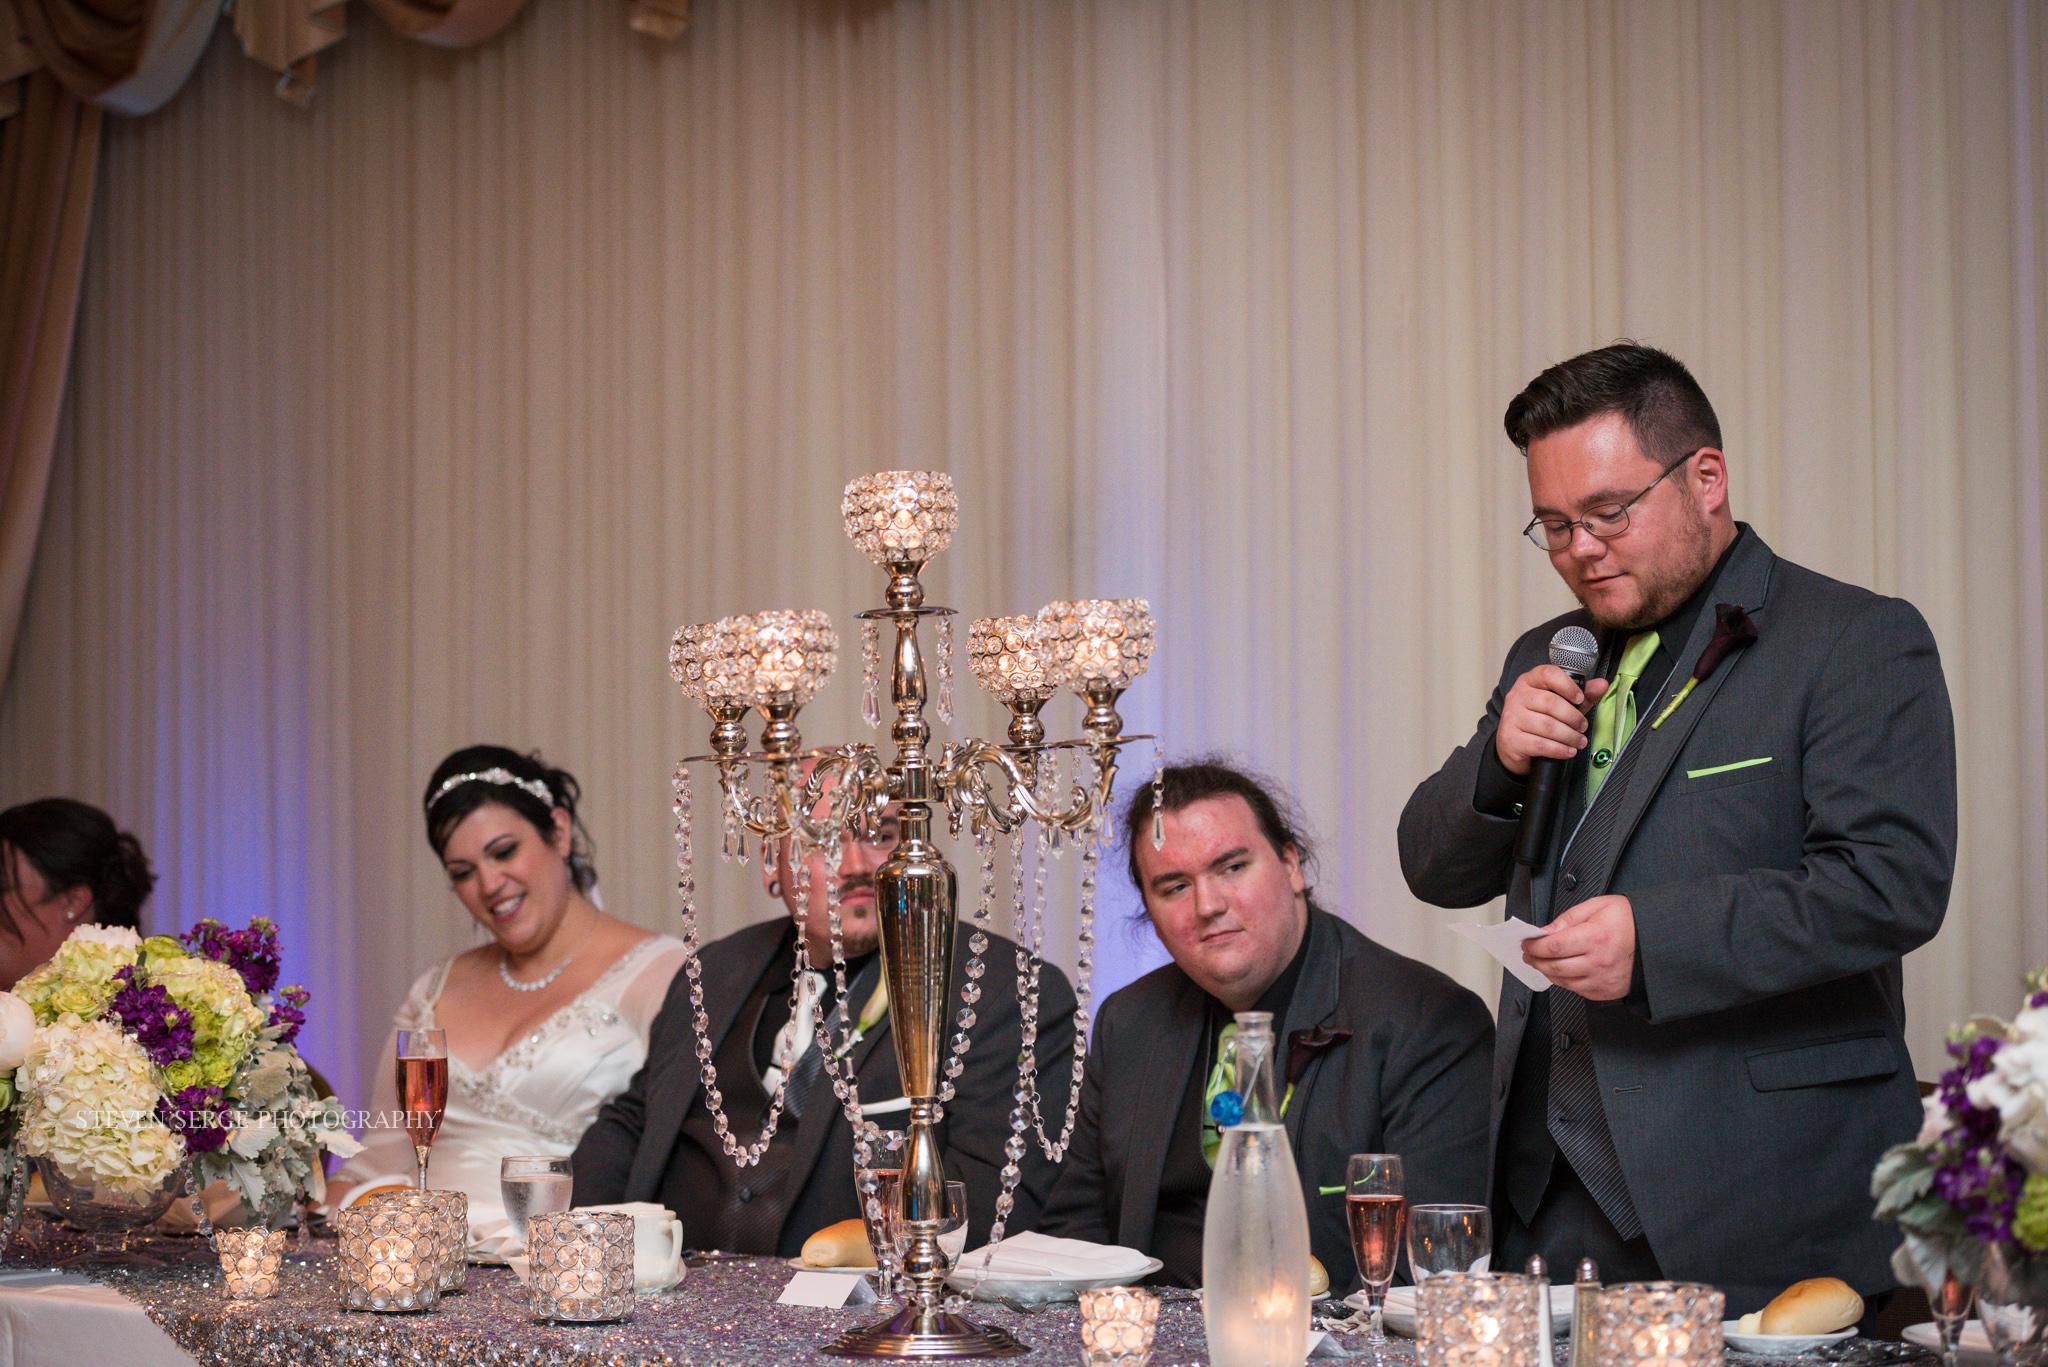 Scranton-wedding-photographer-fiorellis-steven-serge-42.jpg